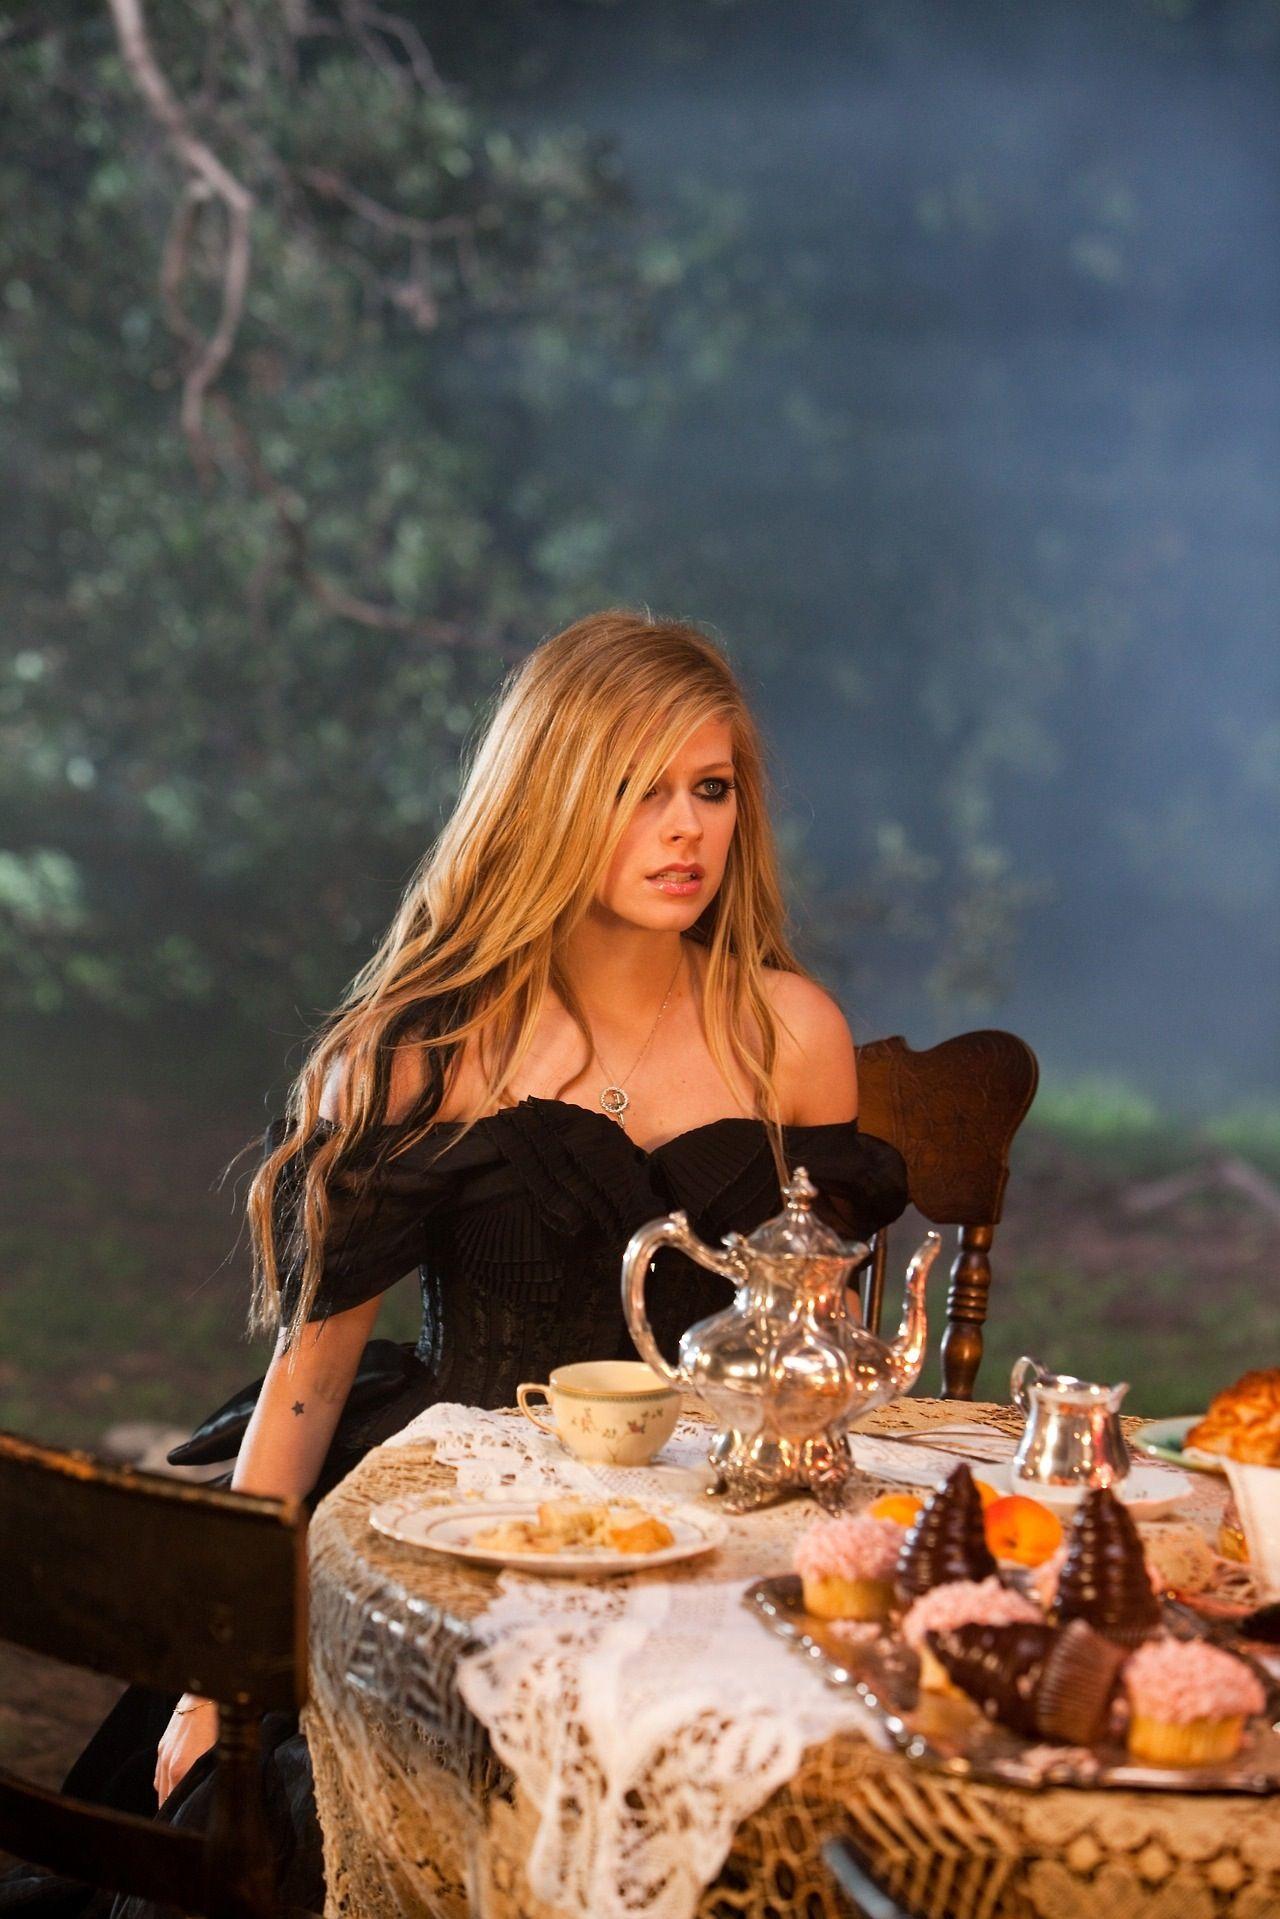 Avril Lavigne FOLLOW ME ON TWITTER https://twitter.com/ReynaAsencio